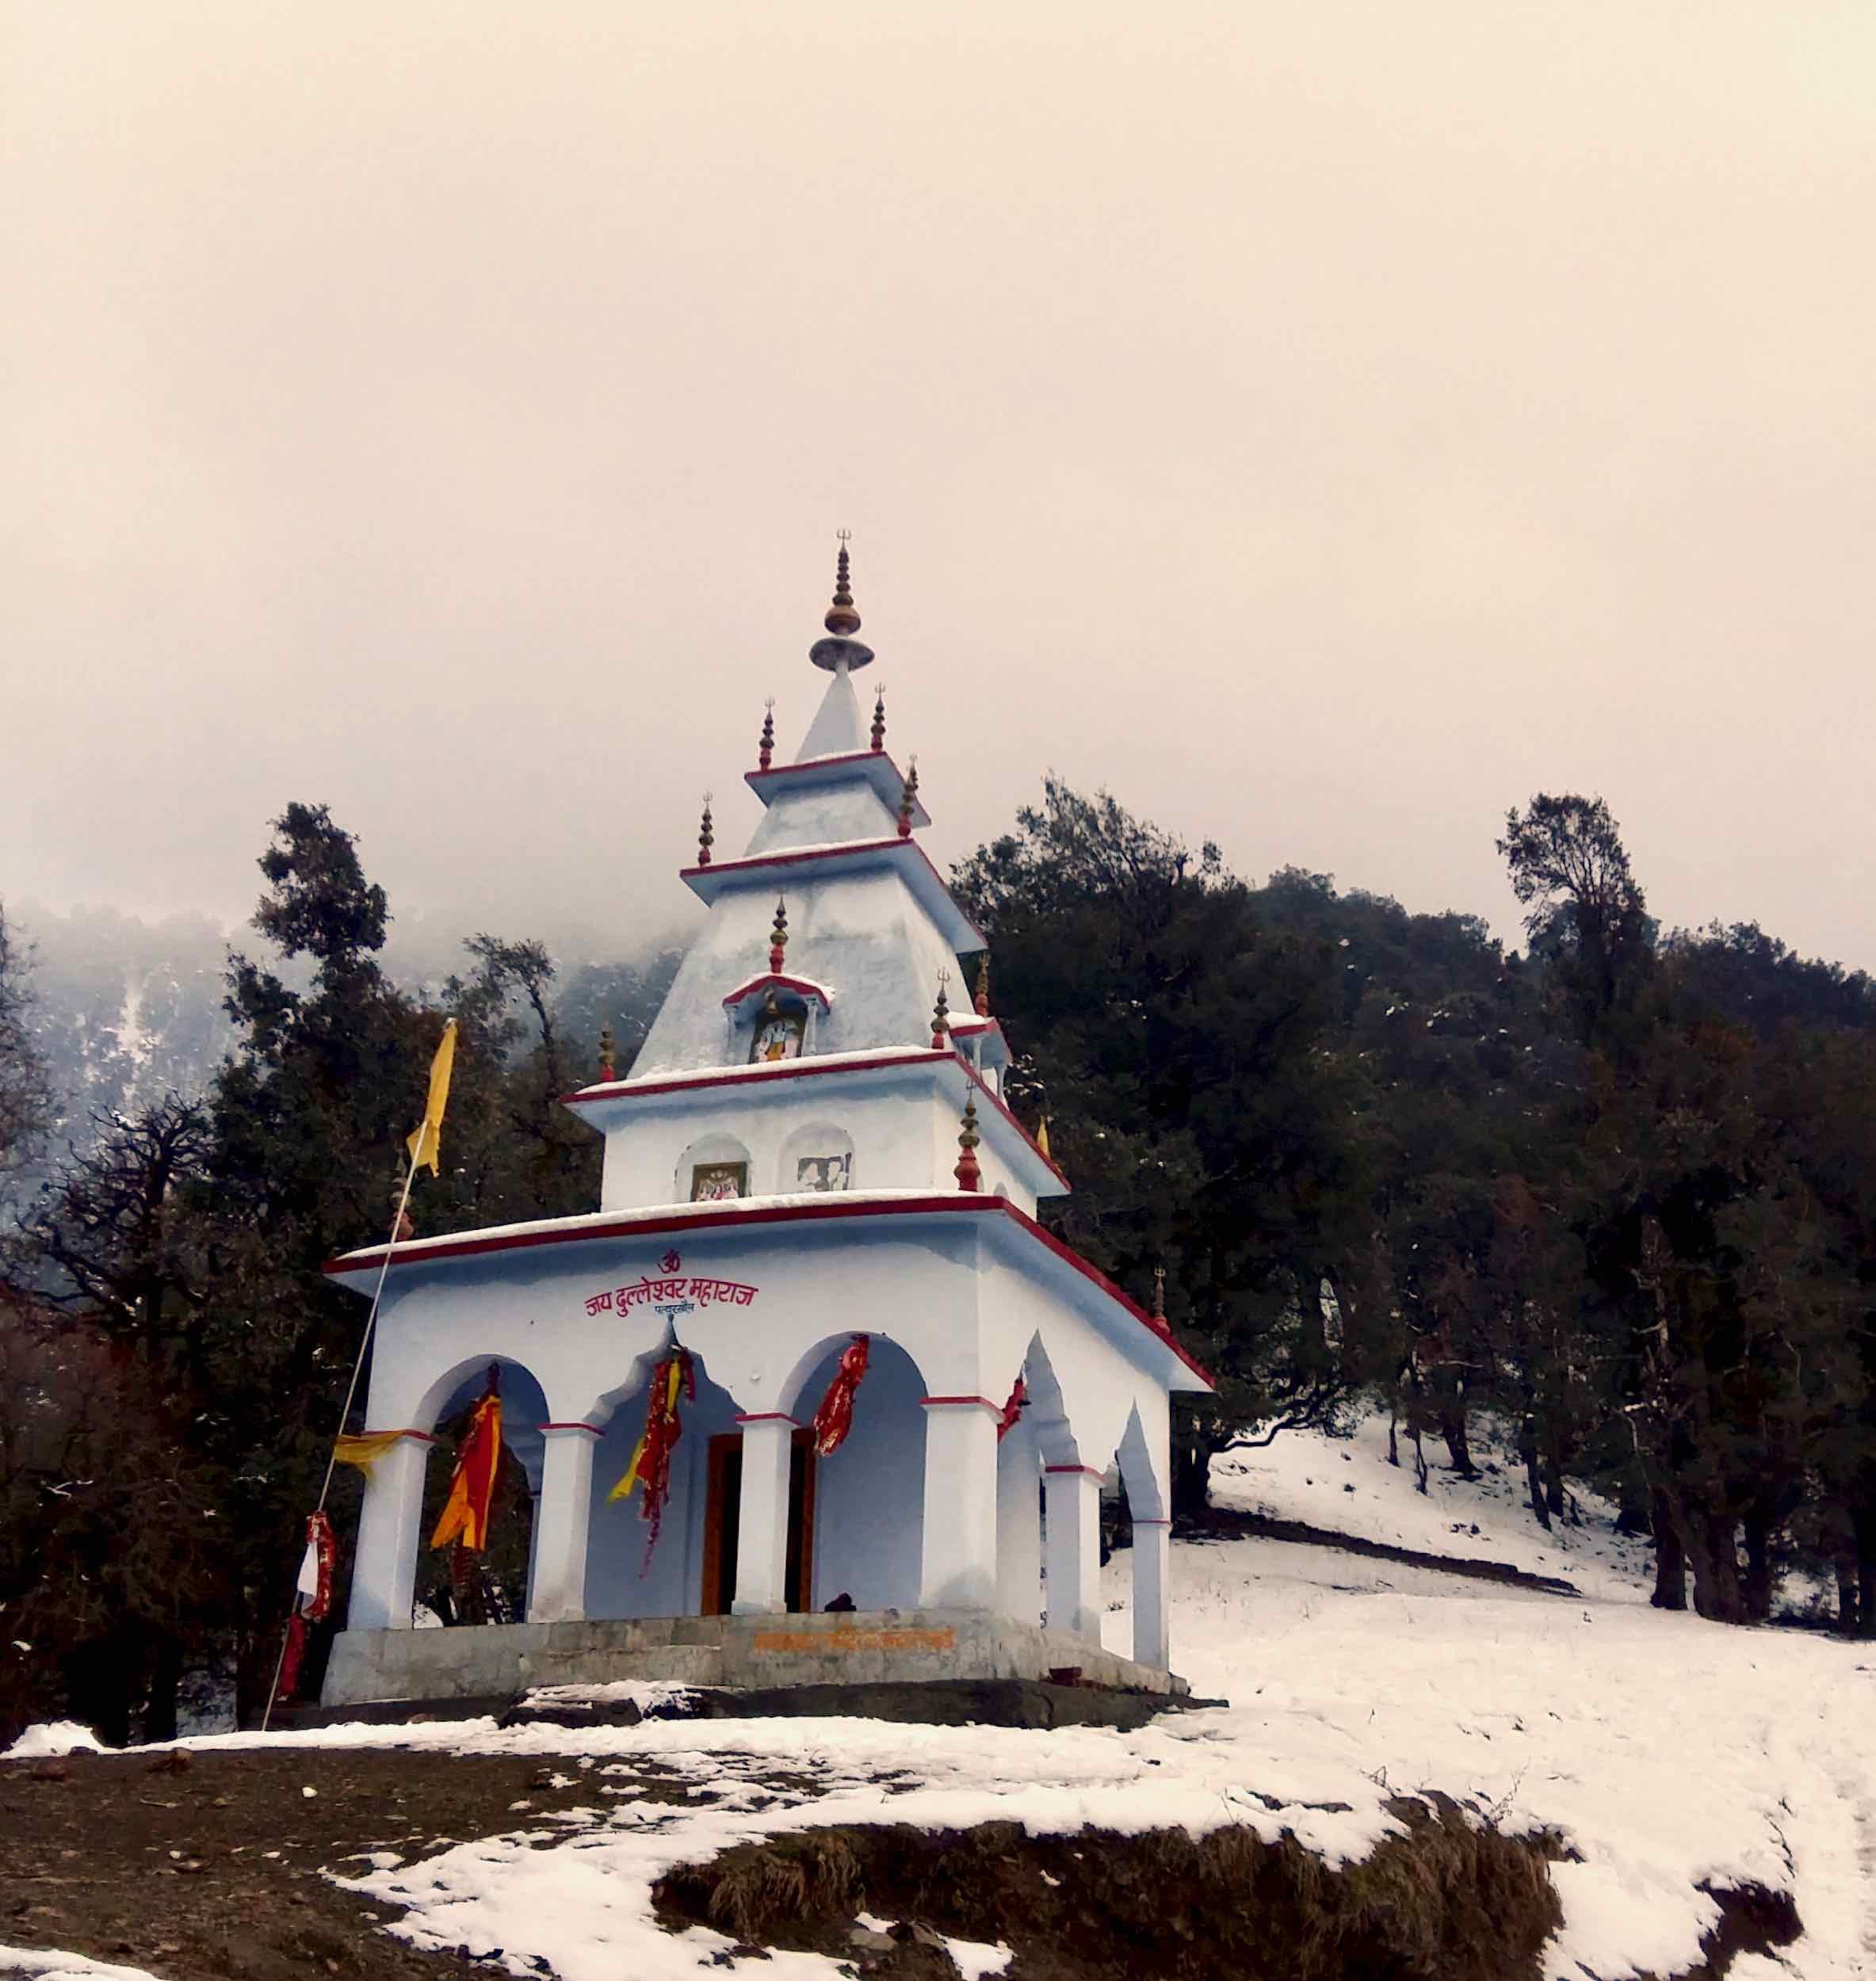 Dulleshwar Maharaj temple at Patharkhol. The local Devata (diety) for this Jaunpur range region.